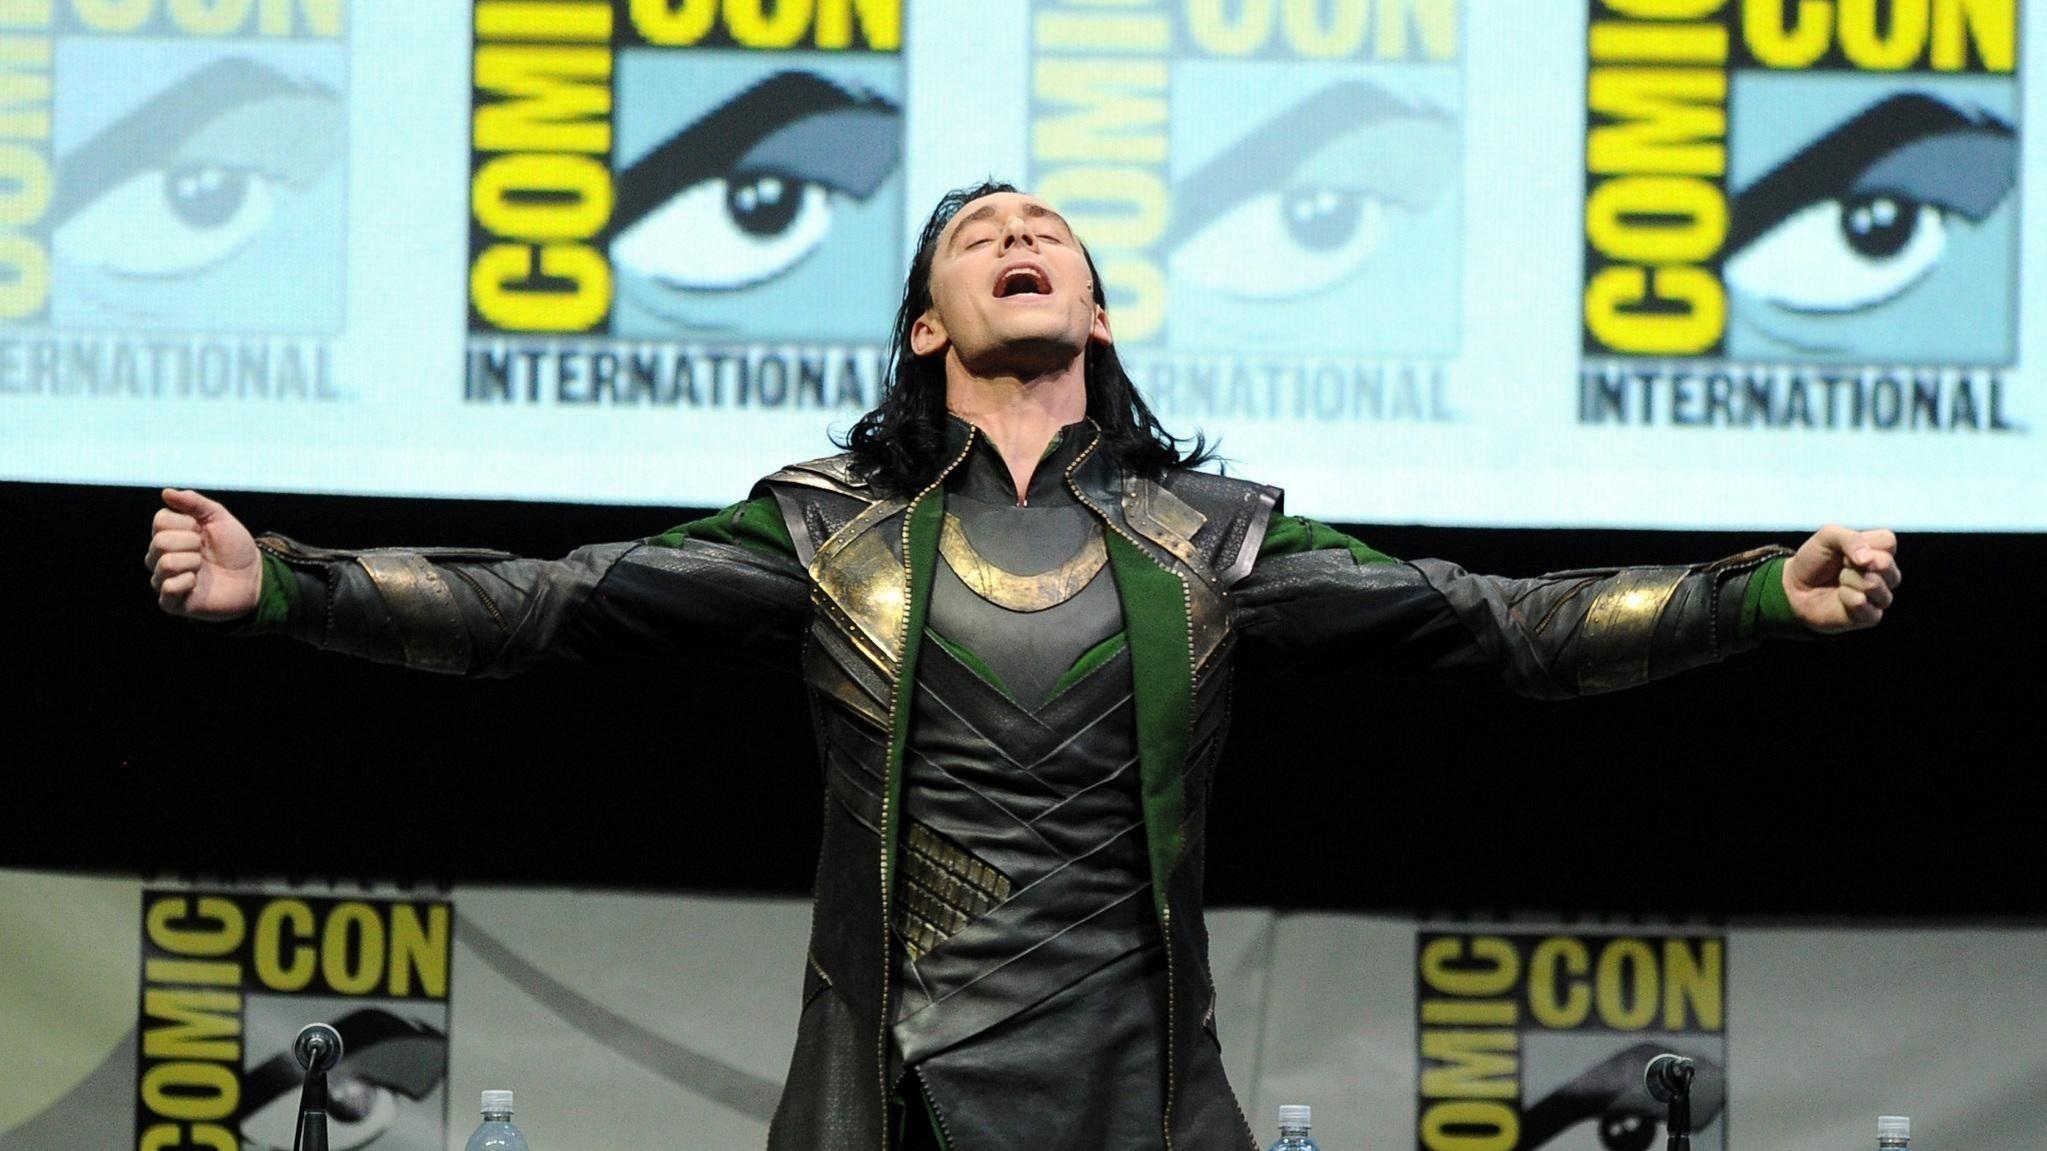 Comic-Con 2018: 10 biggest ways celebrities surprised fans in past